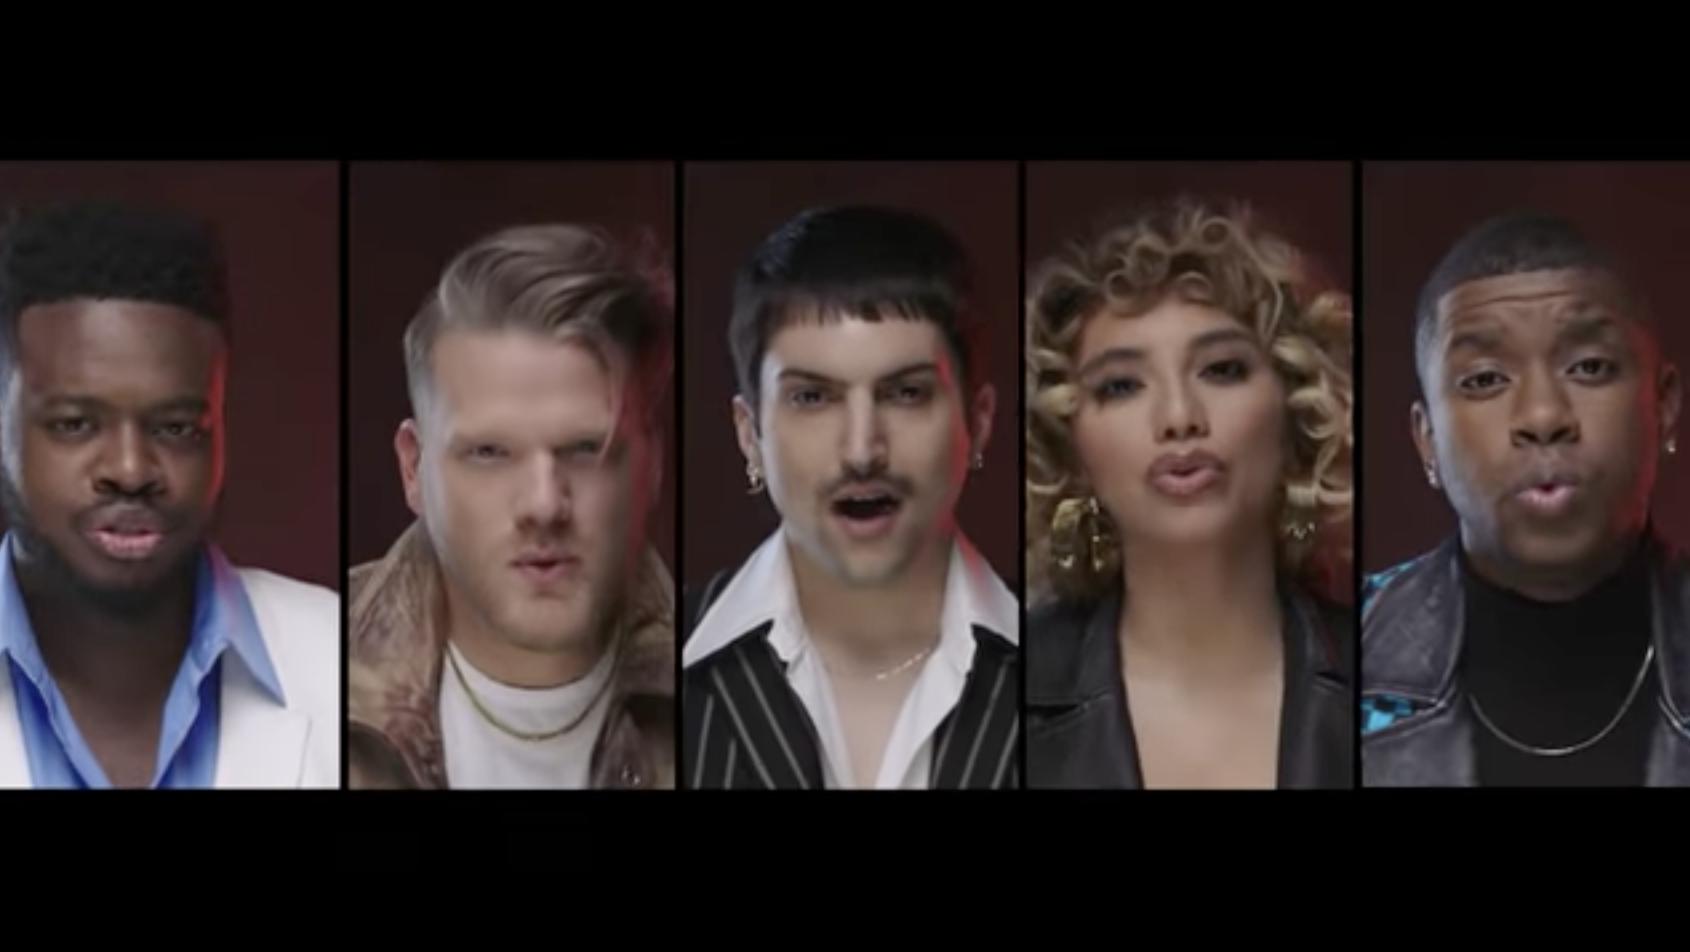 [OFFICIAL VIDEO] 90s Dance Medley - Pentatonix